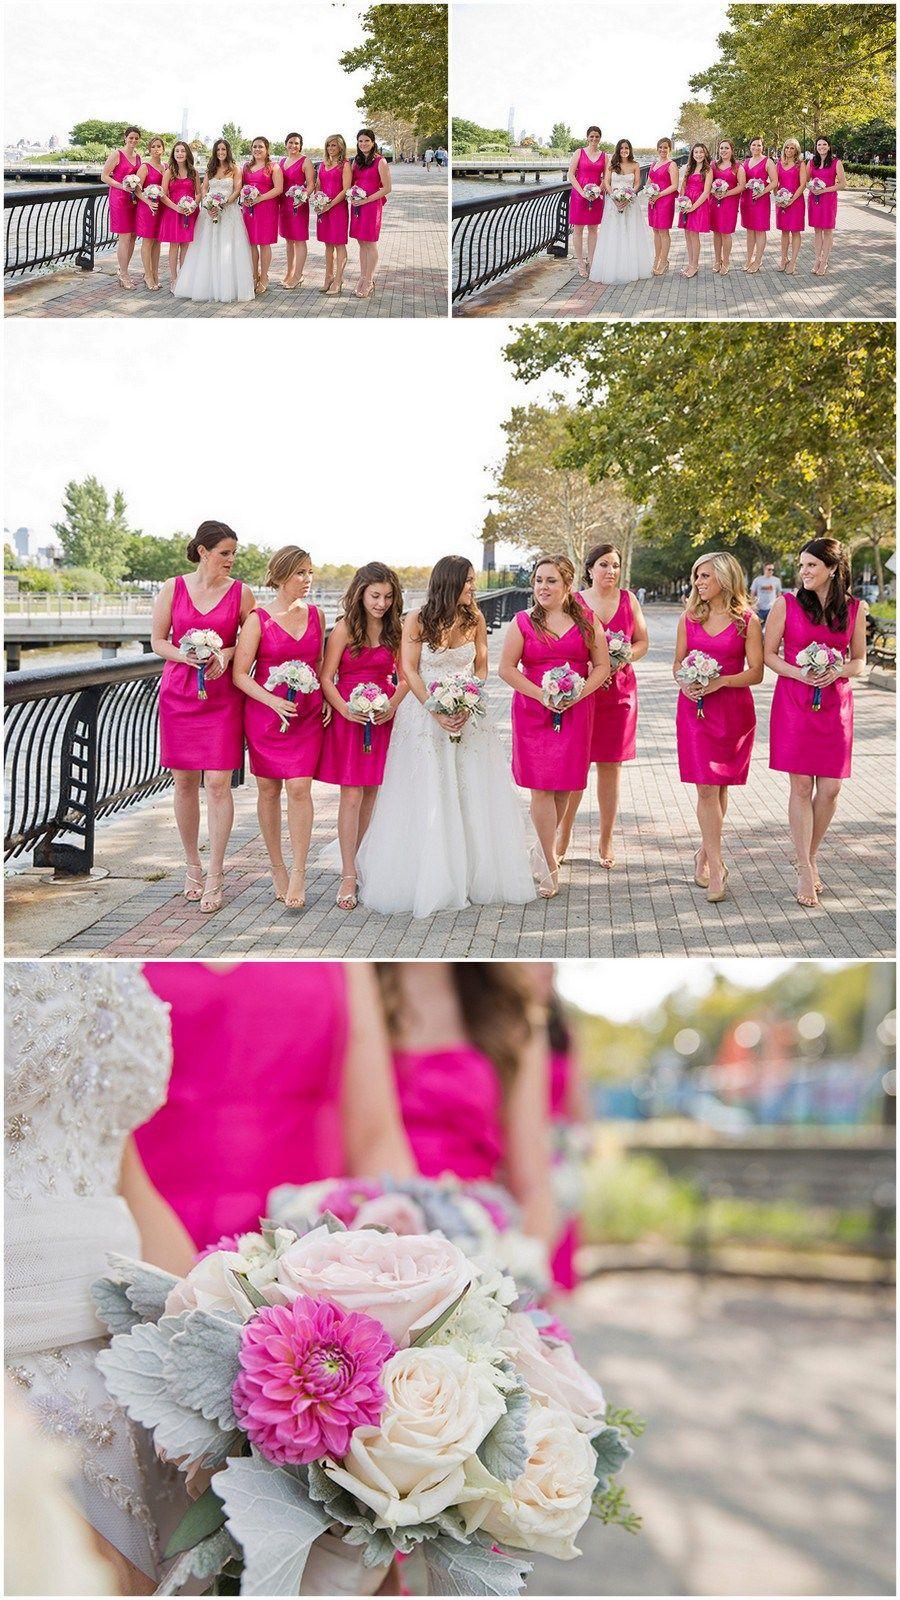 Rustic Chic Summer Wedding by Dawn Joseph Photography | Pinterest ...